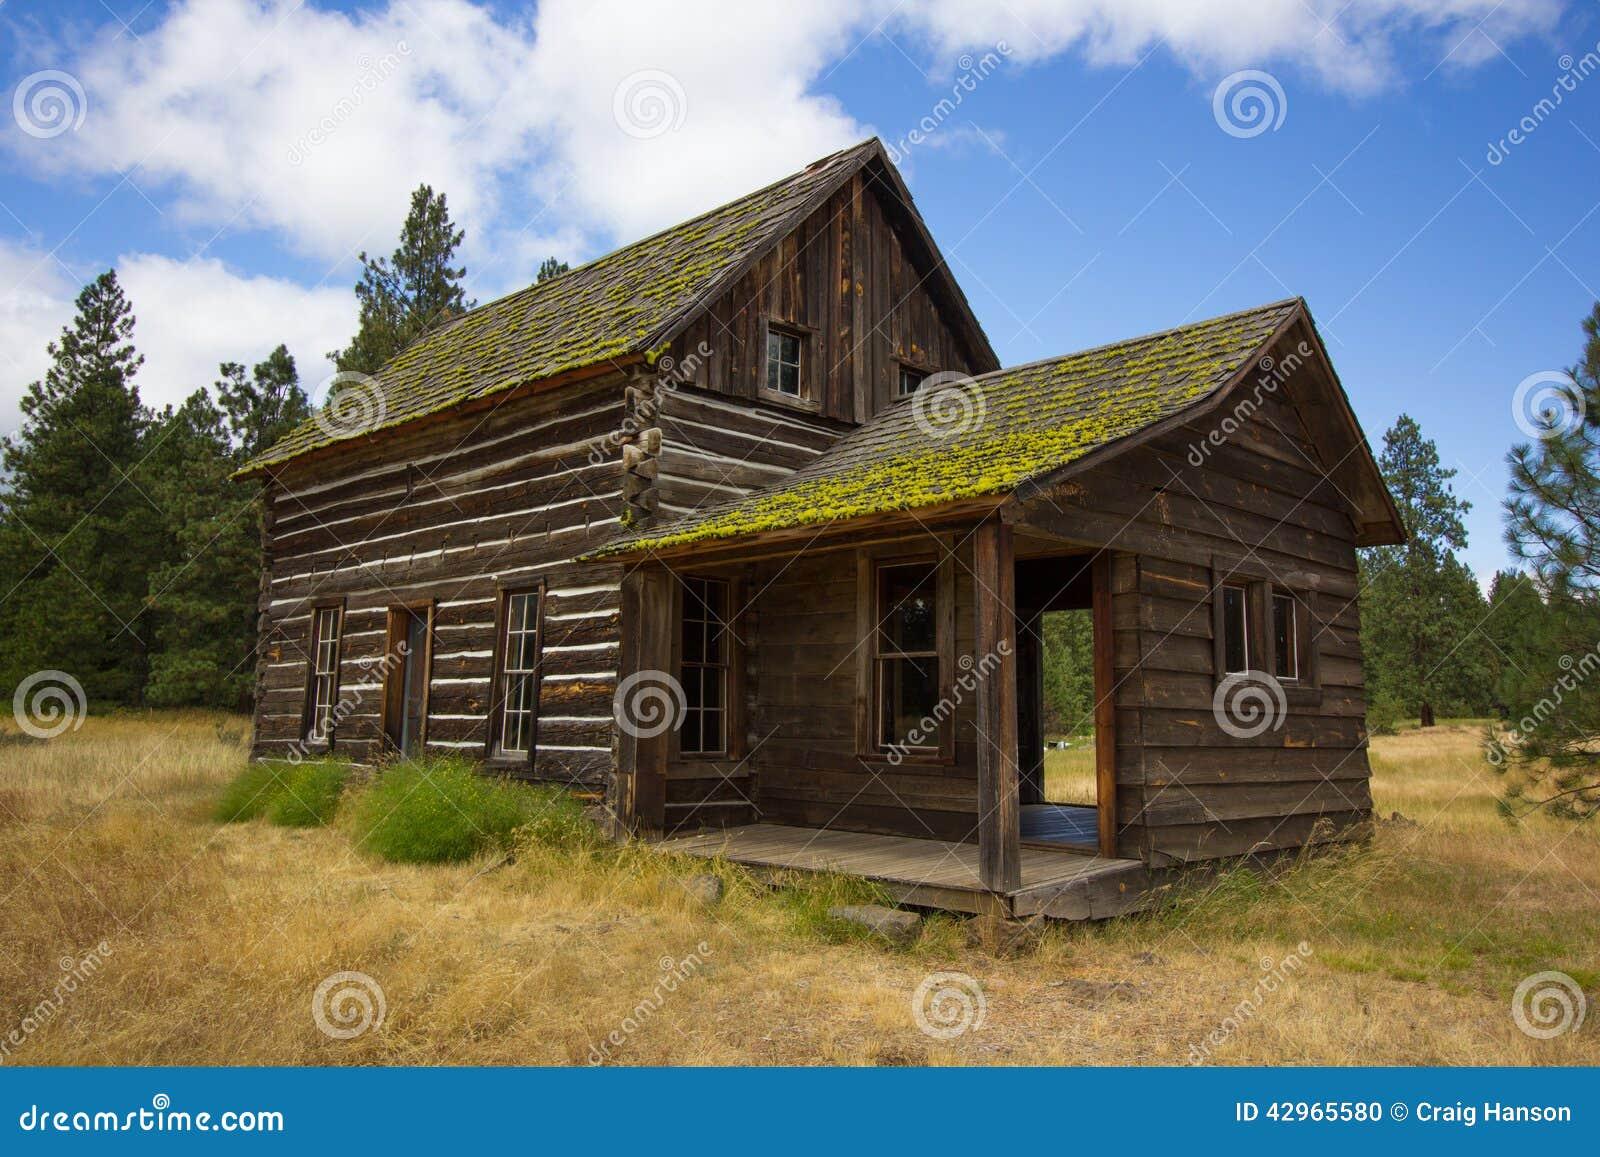 Old Log Cabin Stock Photo Image 42965580